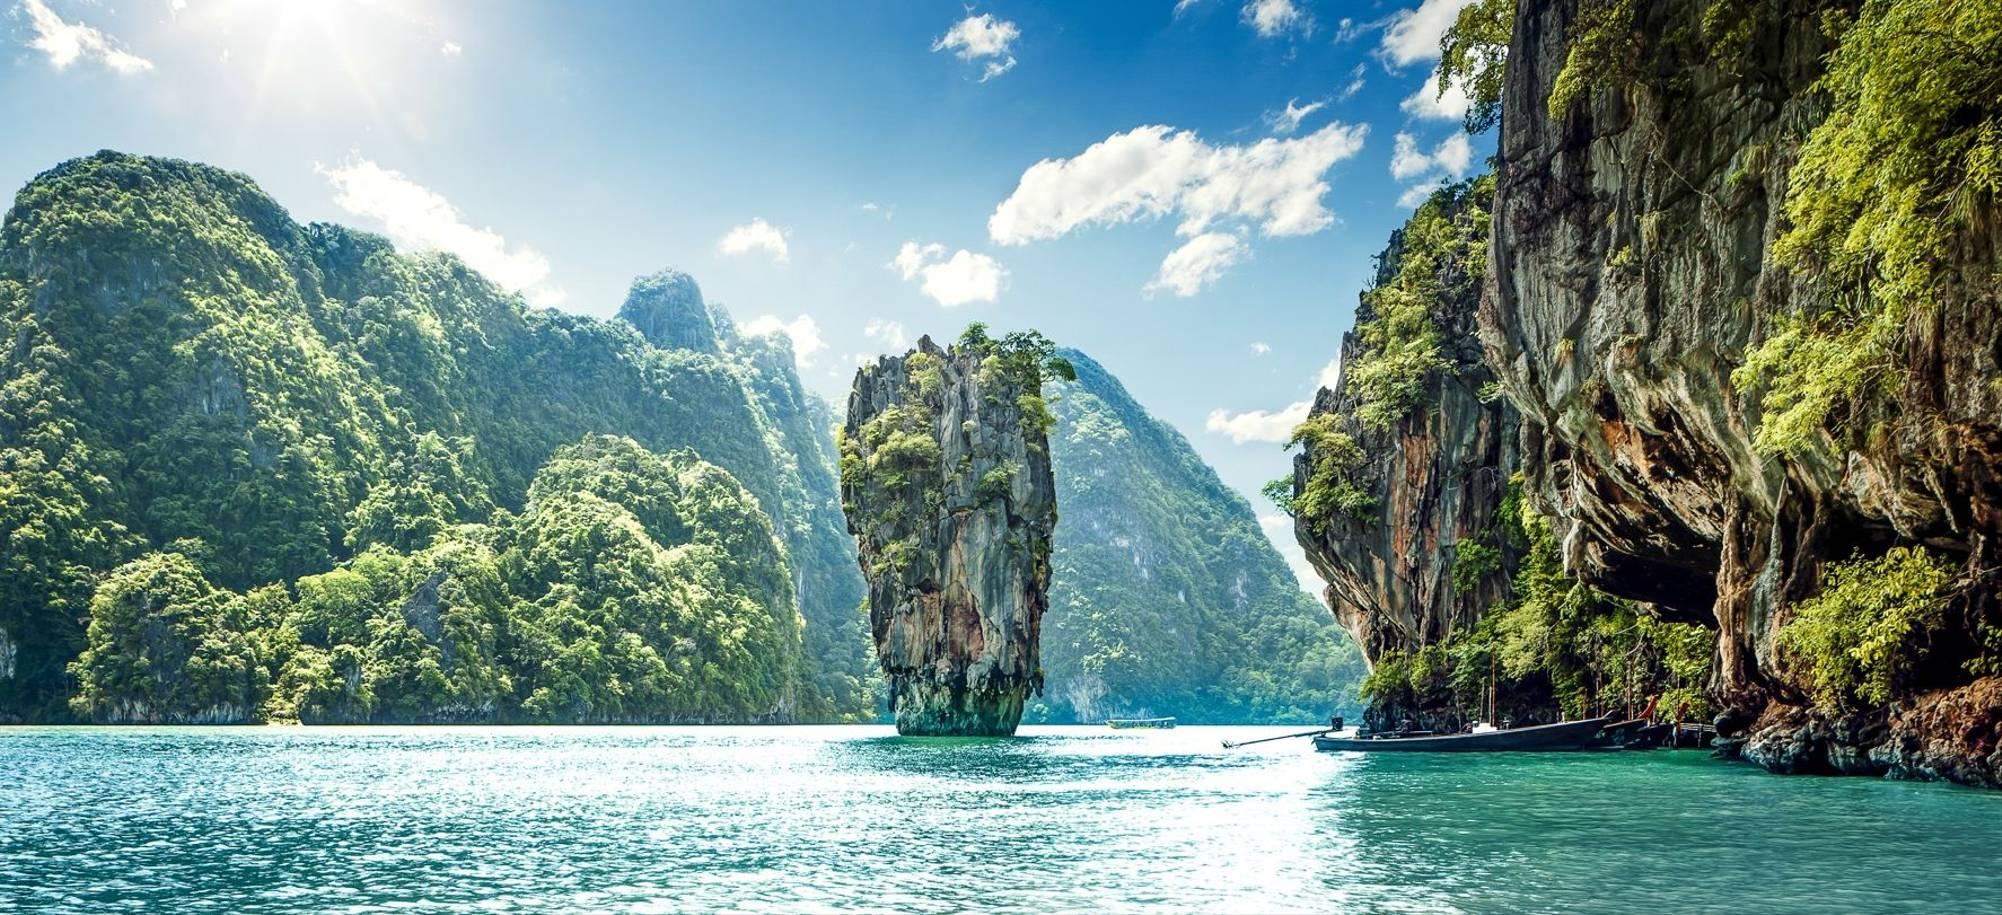 20 Day   Phuket, Phang Nga National Park   Itinerary Desktop